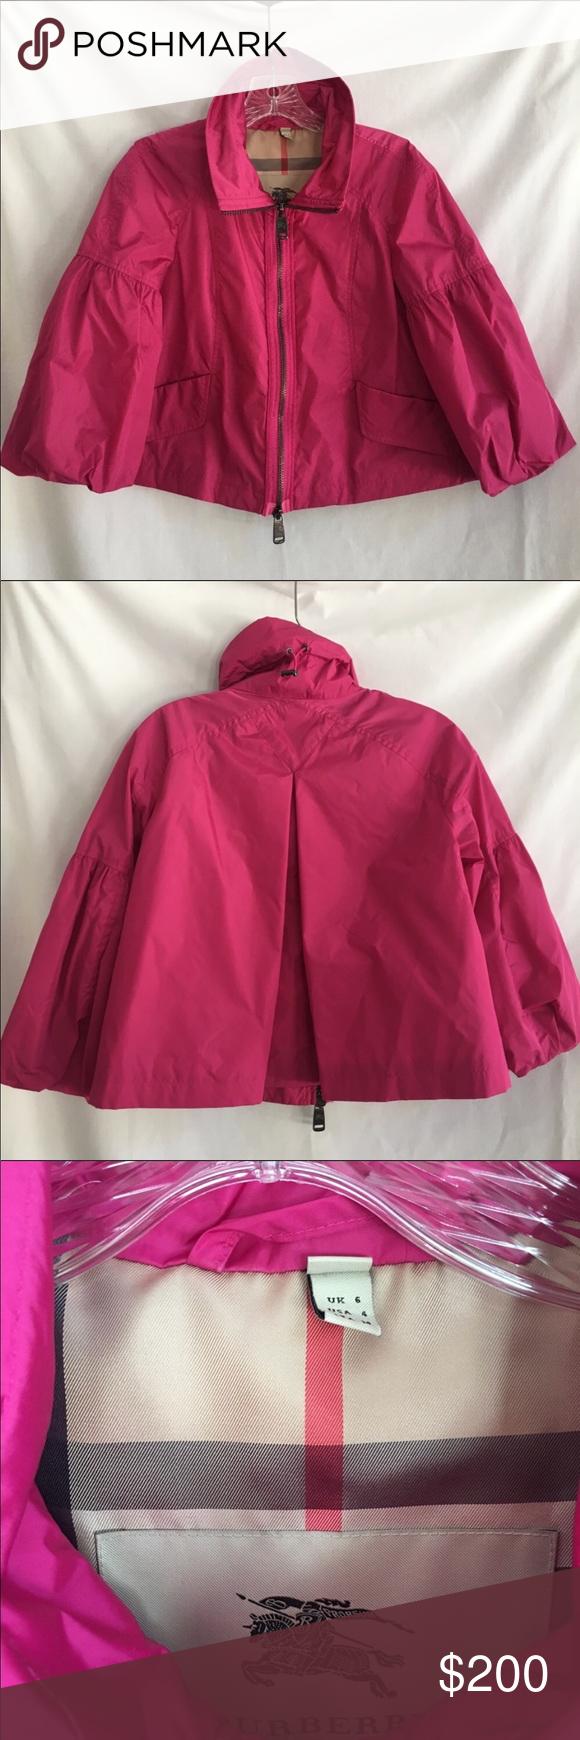 393c2ac33b7 Burberry Pink Cropped Rain ☔️ Jacket in 2018   My Posh Closet ...